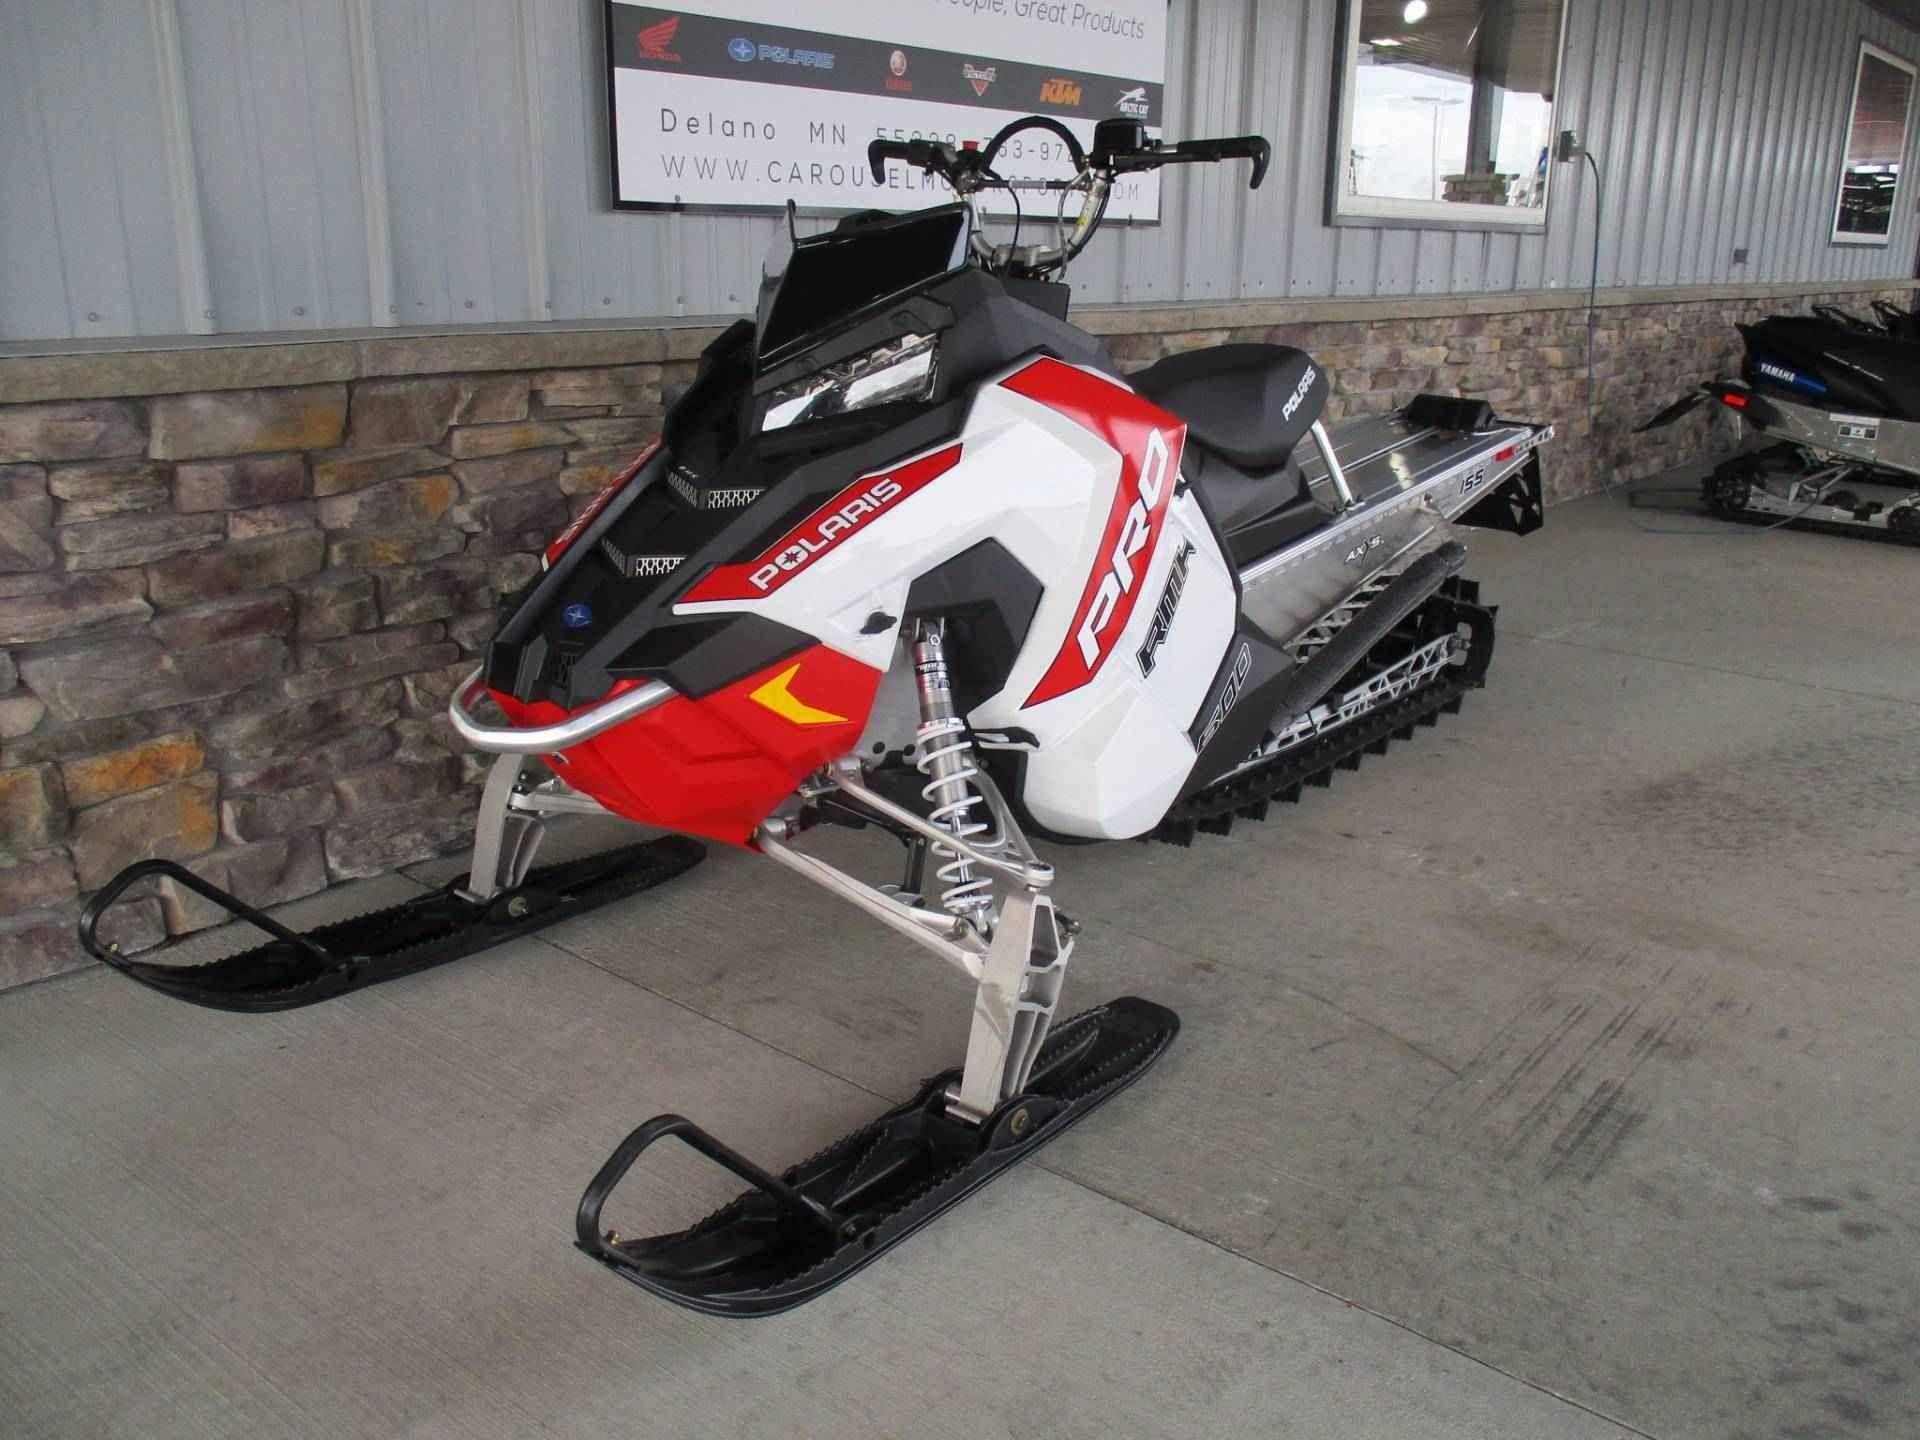 New 2016 Polaris 600 PRORMK 155 ES Snowmobile For Sale in